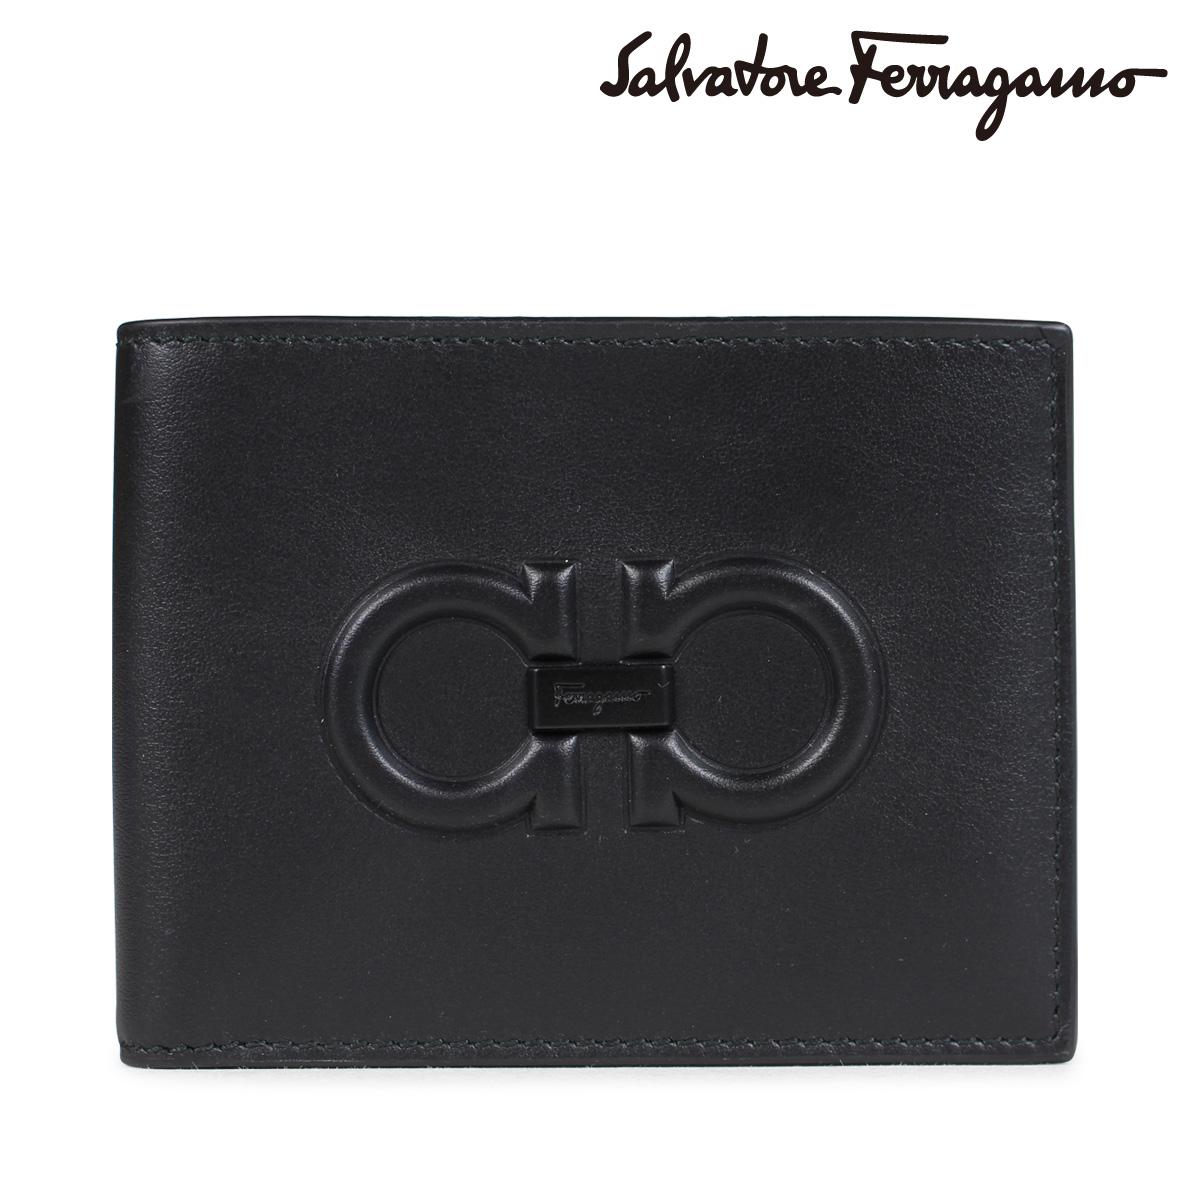 Salvatore Ferragamo FIRENZE LOGO WALLET フェラガモ 財布 メンズ 二つ折り ブラック 66A248